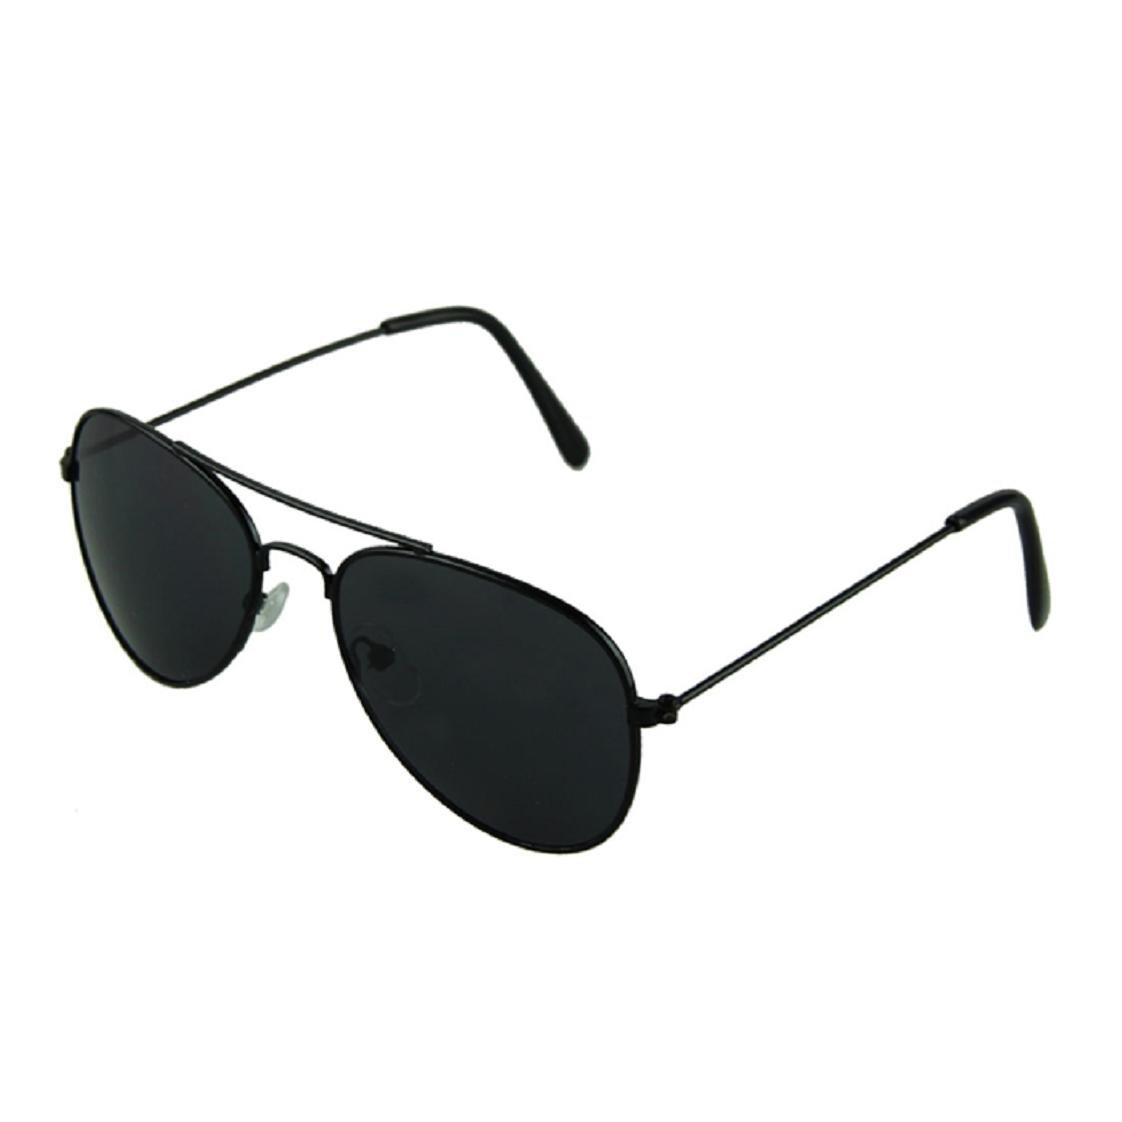 Mchoice New Cool Fashion Mercury Ultraviolet-proof Baby Children Kids Boy Girl Goggles Metal Frame Child Sunglasses (Black)